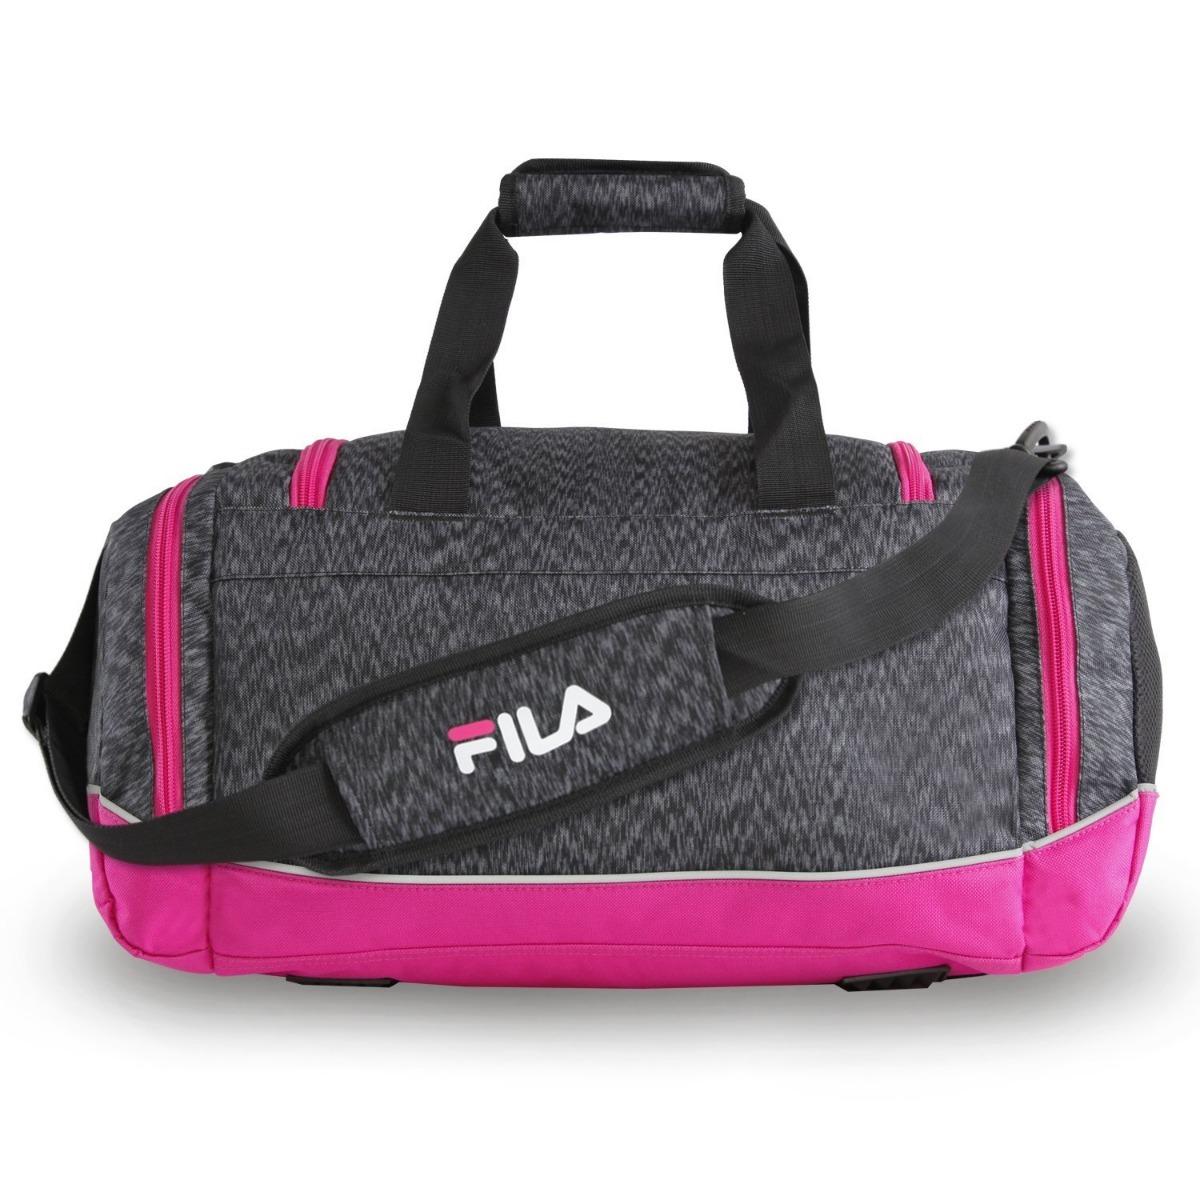 b3fab81d863d5 Fila Sprinter - Bolsa Deportiva Para Gimnasio (static Pink ...